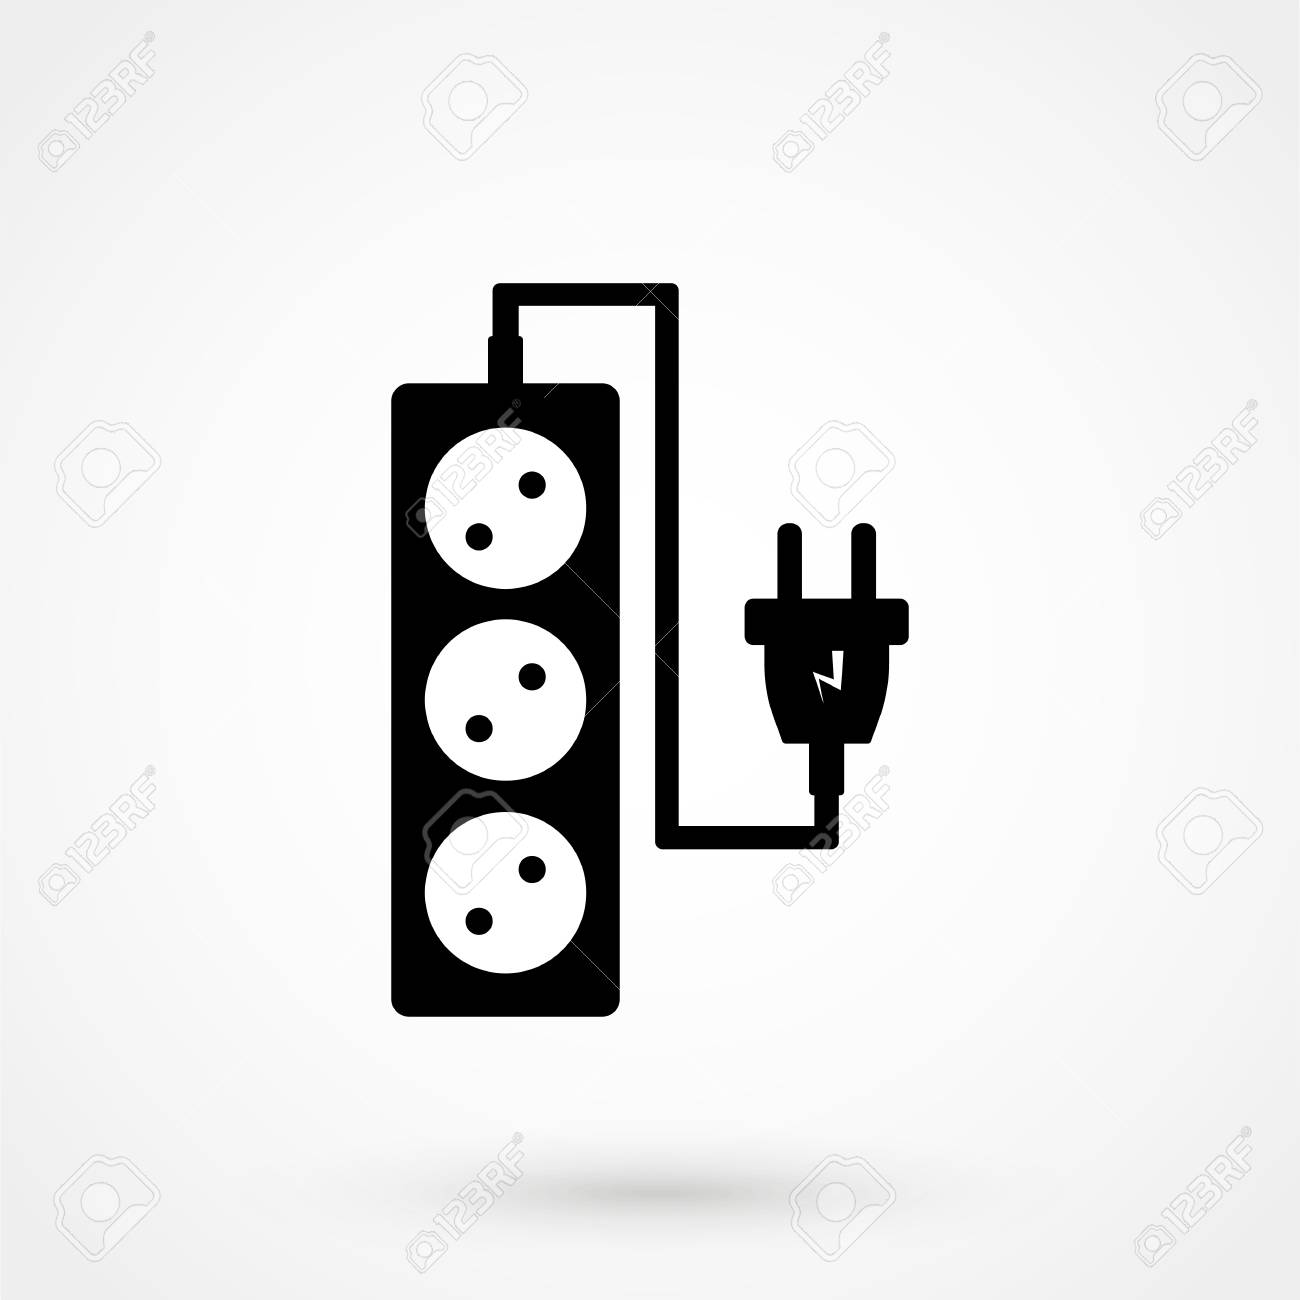 Electrical Socket Sign Black Electric Plug And Socket Electrical